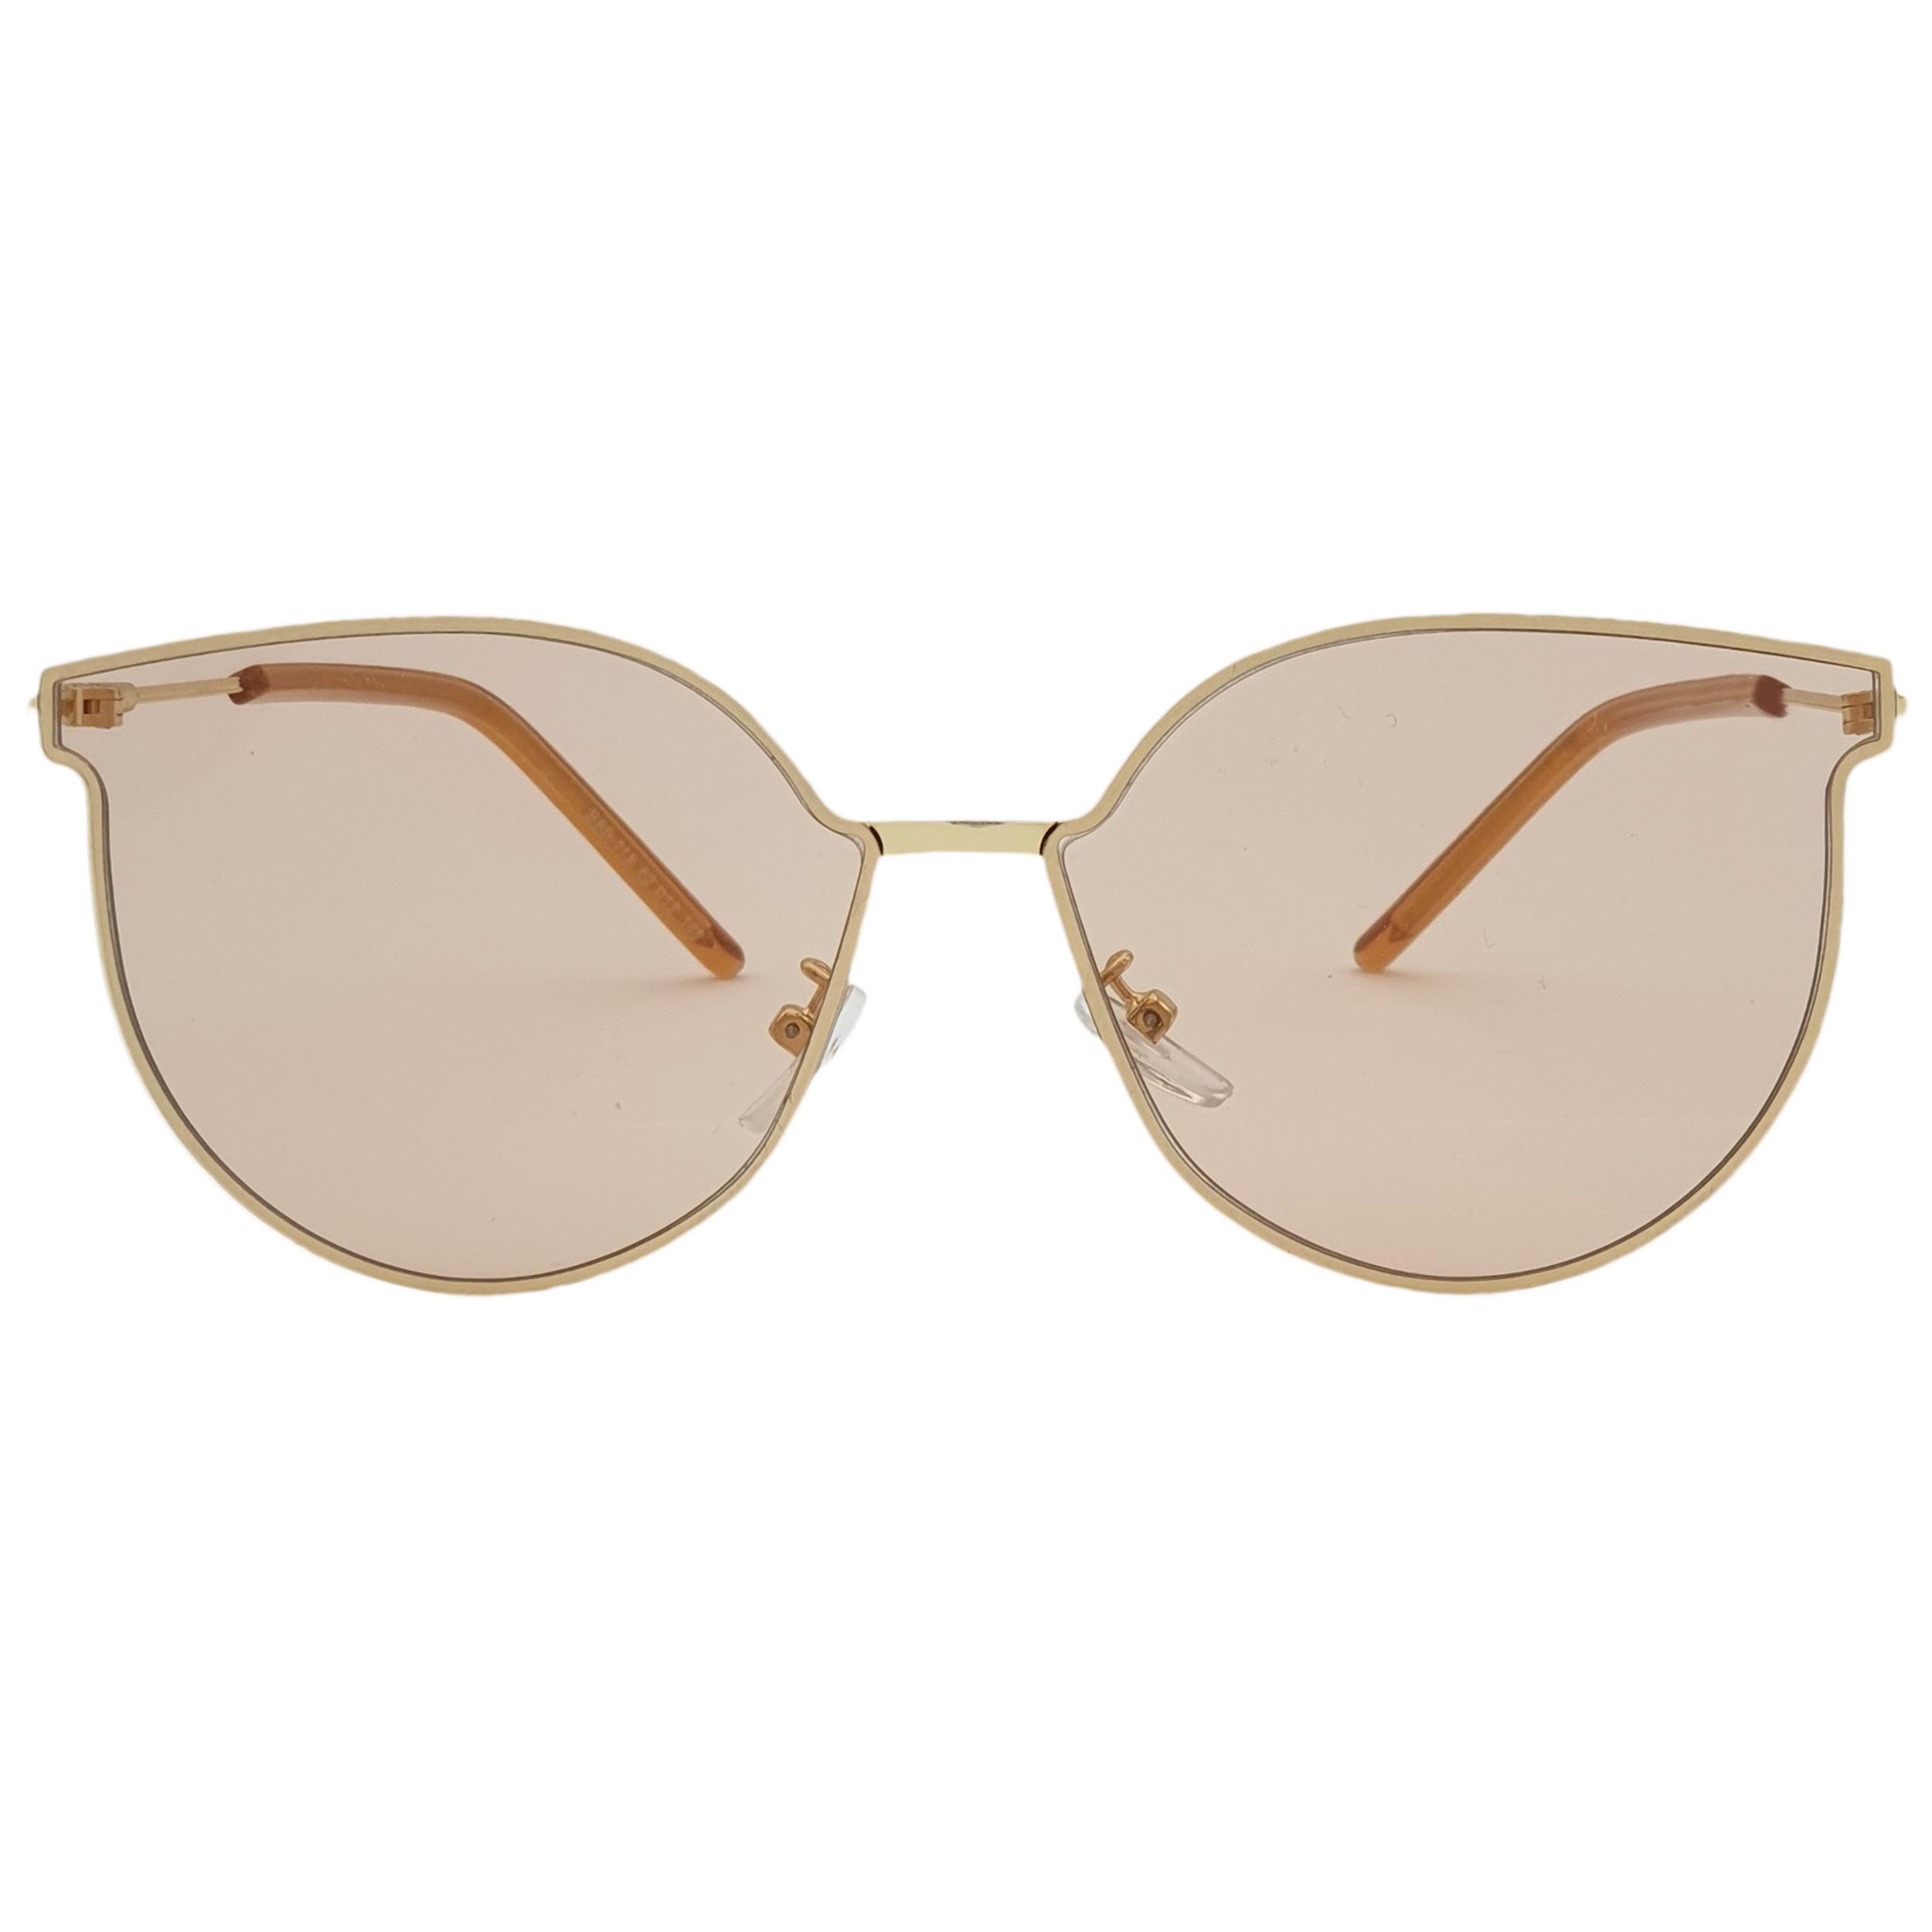 عینک آفتابی زنانه کد B80-1